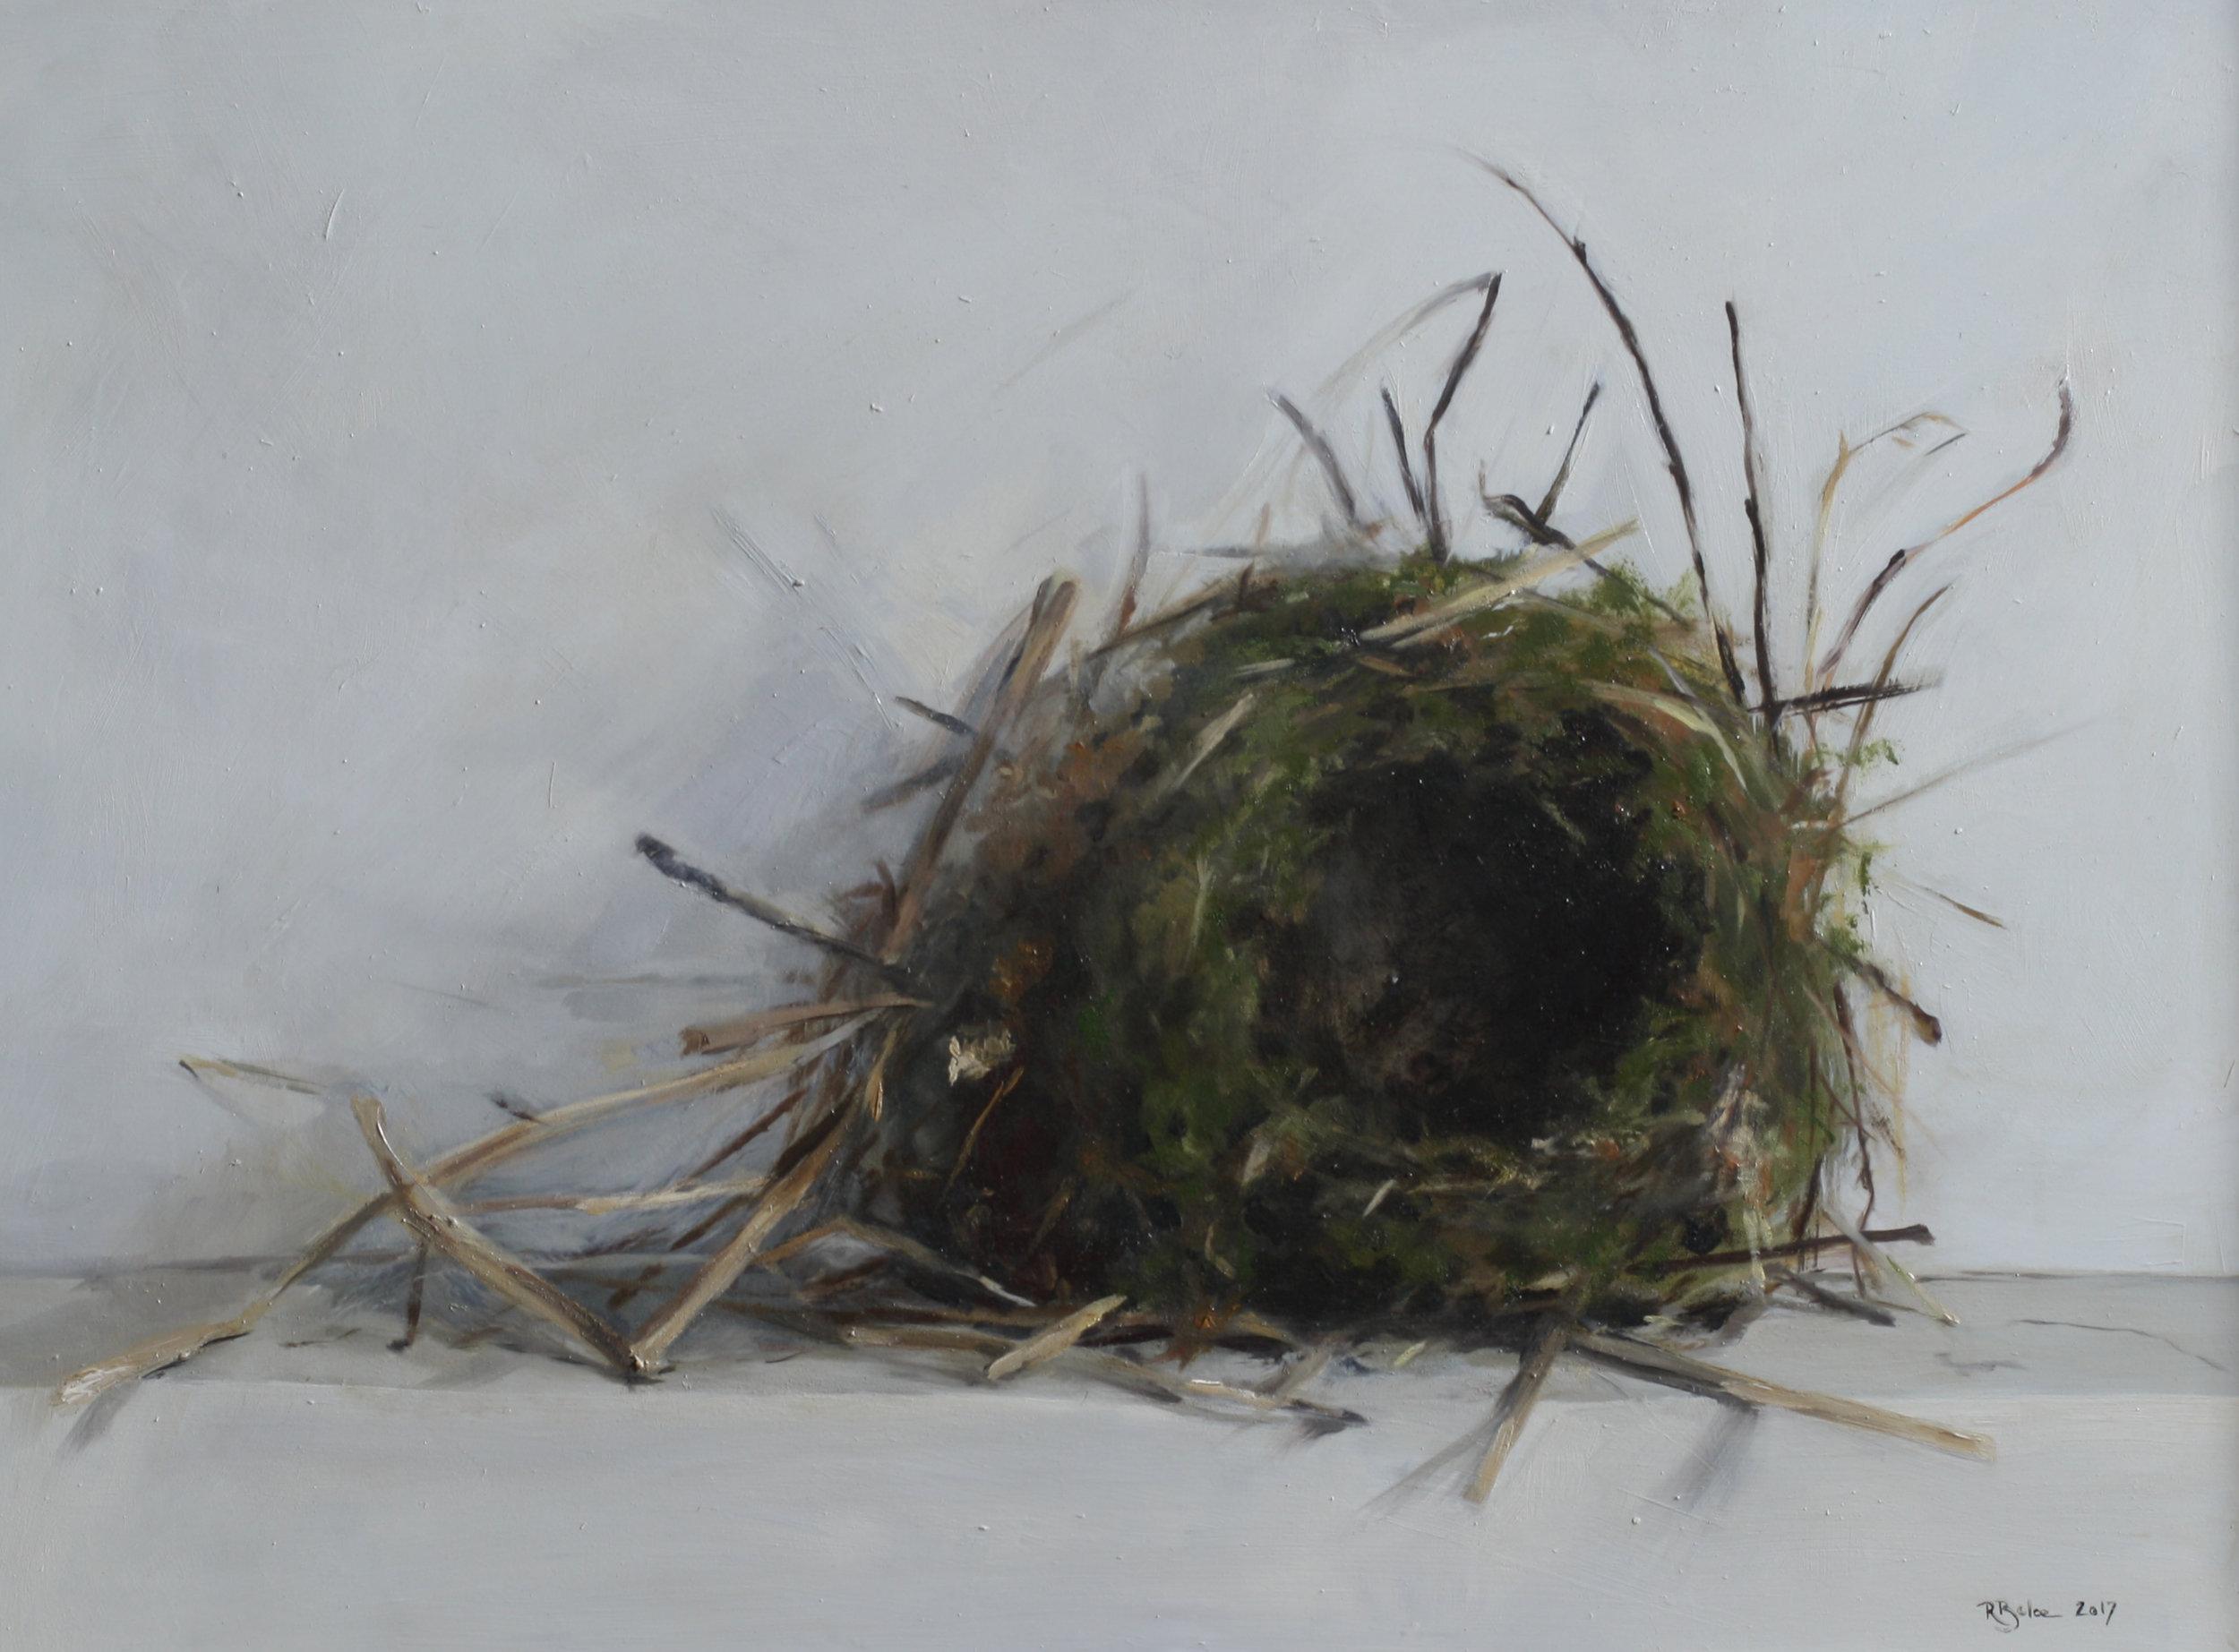 Birds Nest  oil on gesso panel  30 x 40cm painting size  45 x 55cm frame size  £850